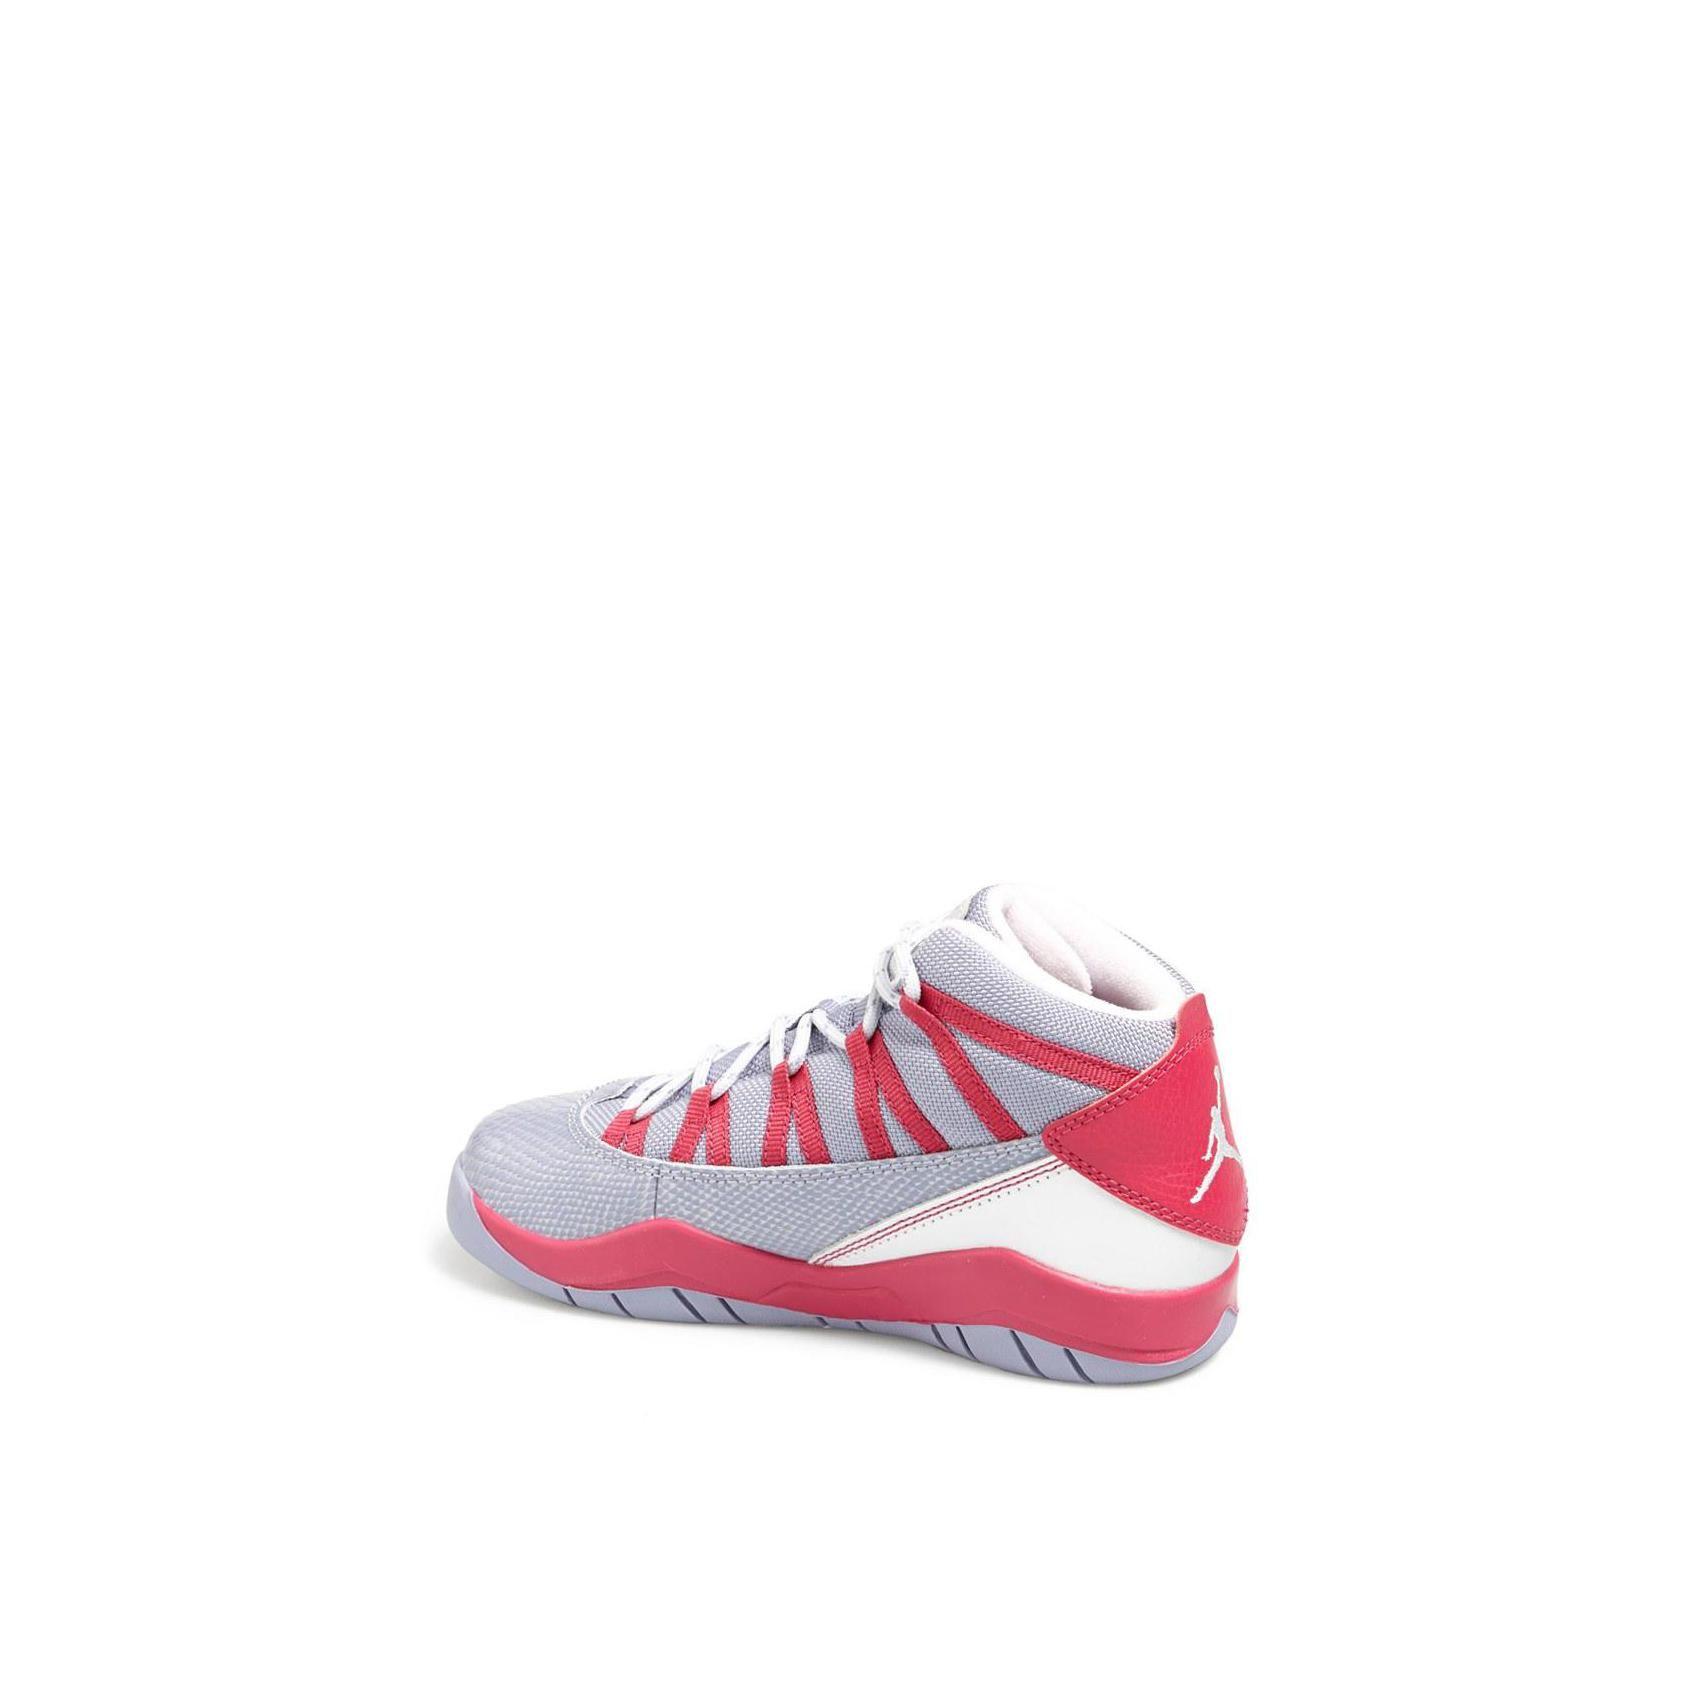 baby boy nike infant | Nike 'Jordan Prime Flight' Basketball Shoe (Toddler &